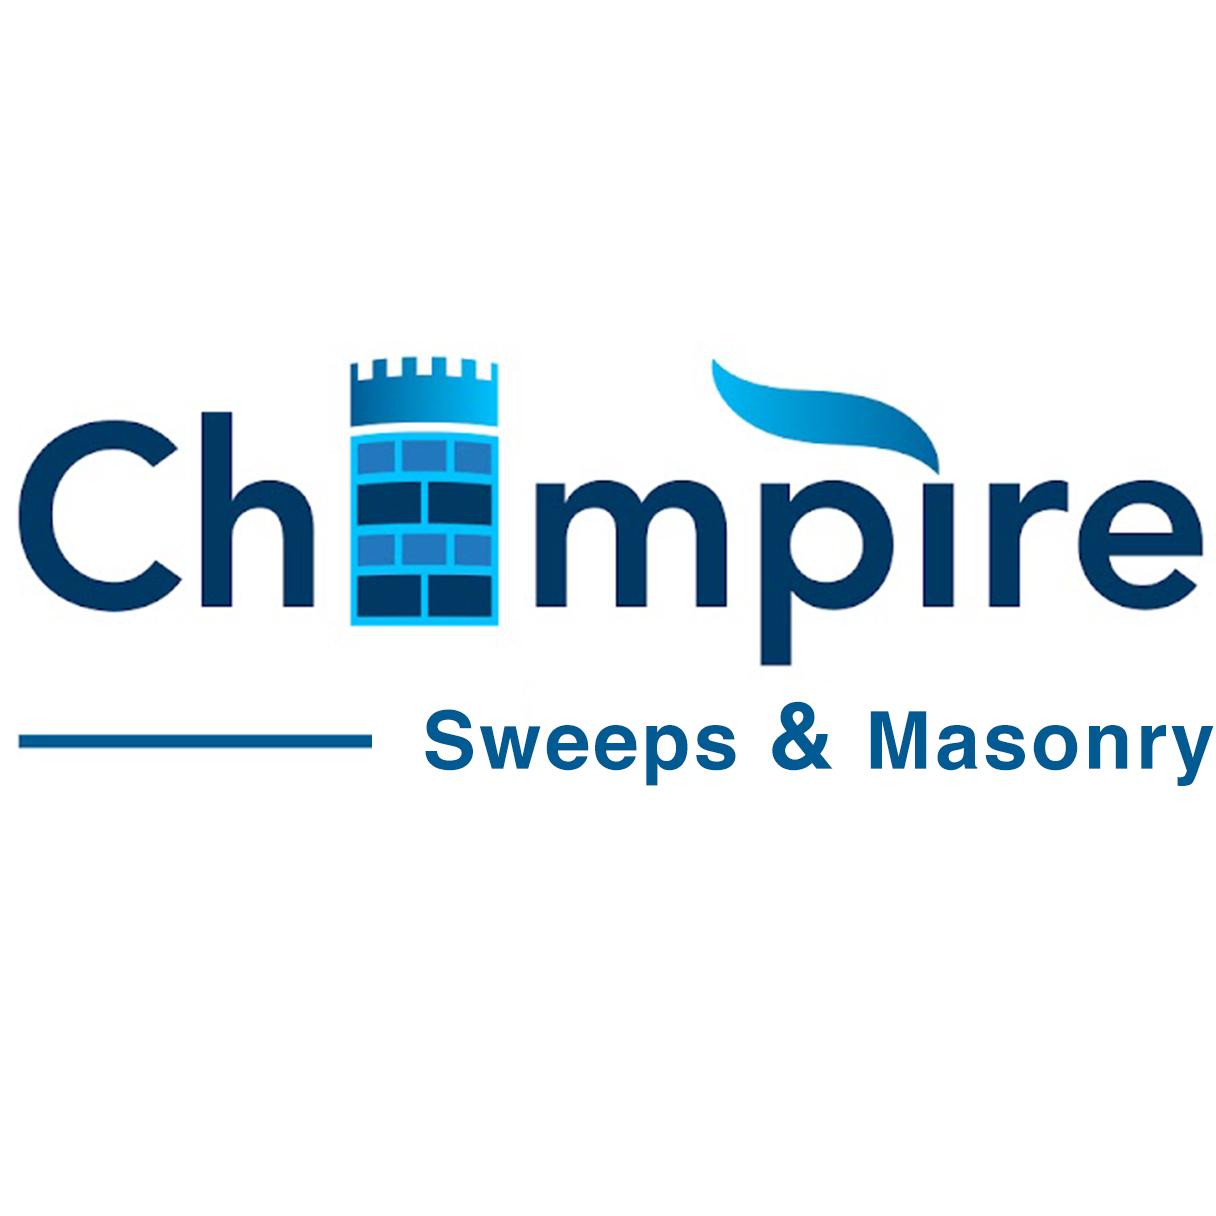 Chimpire Sweeps & Masonry